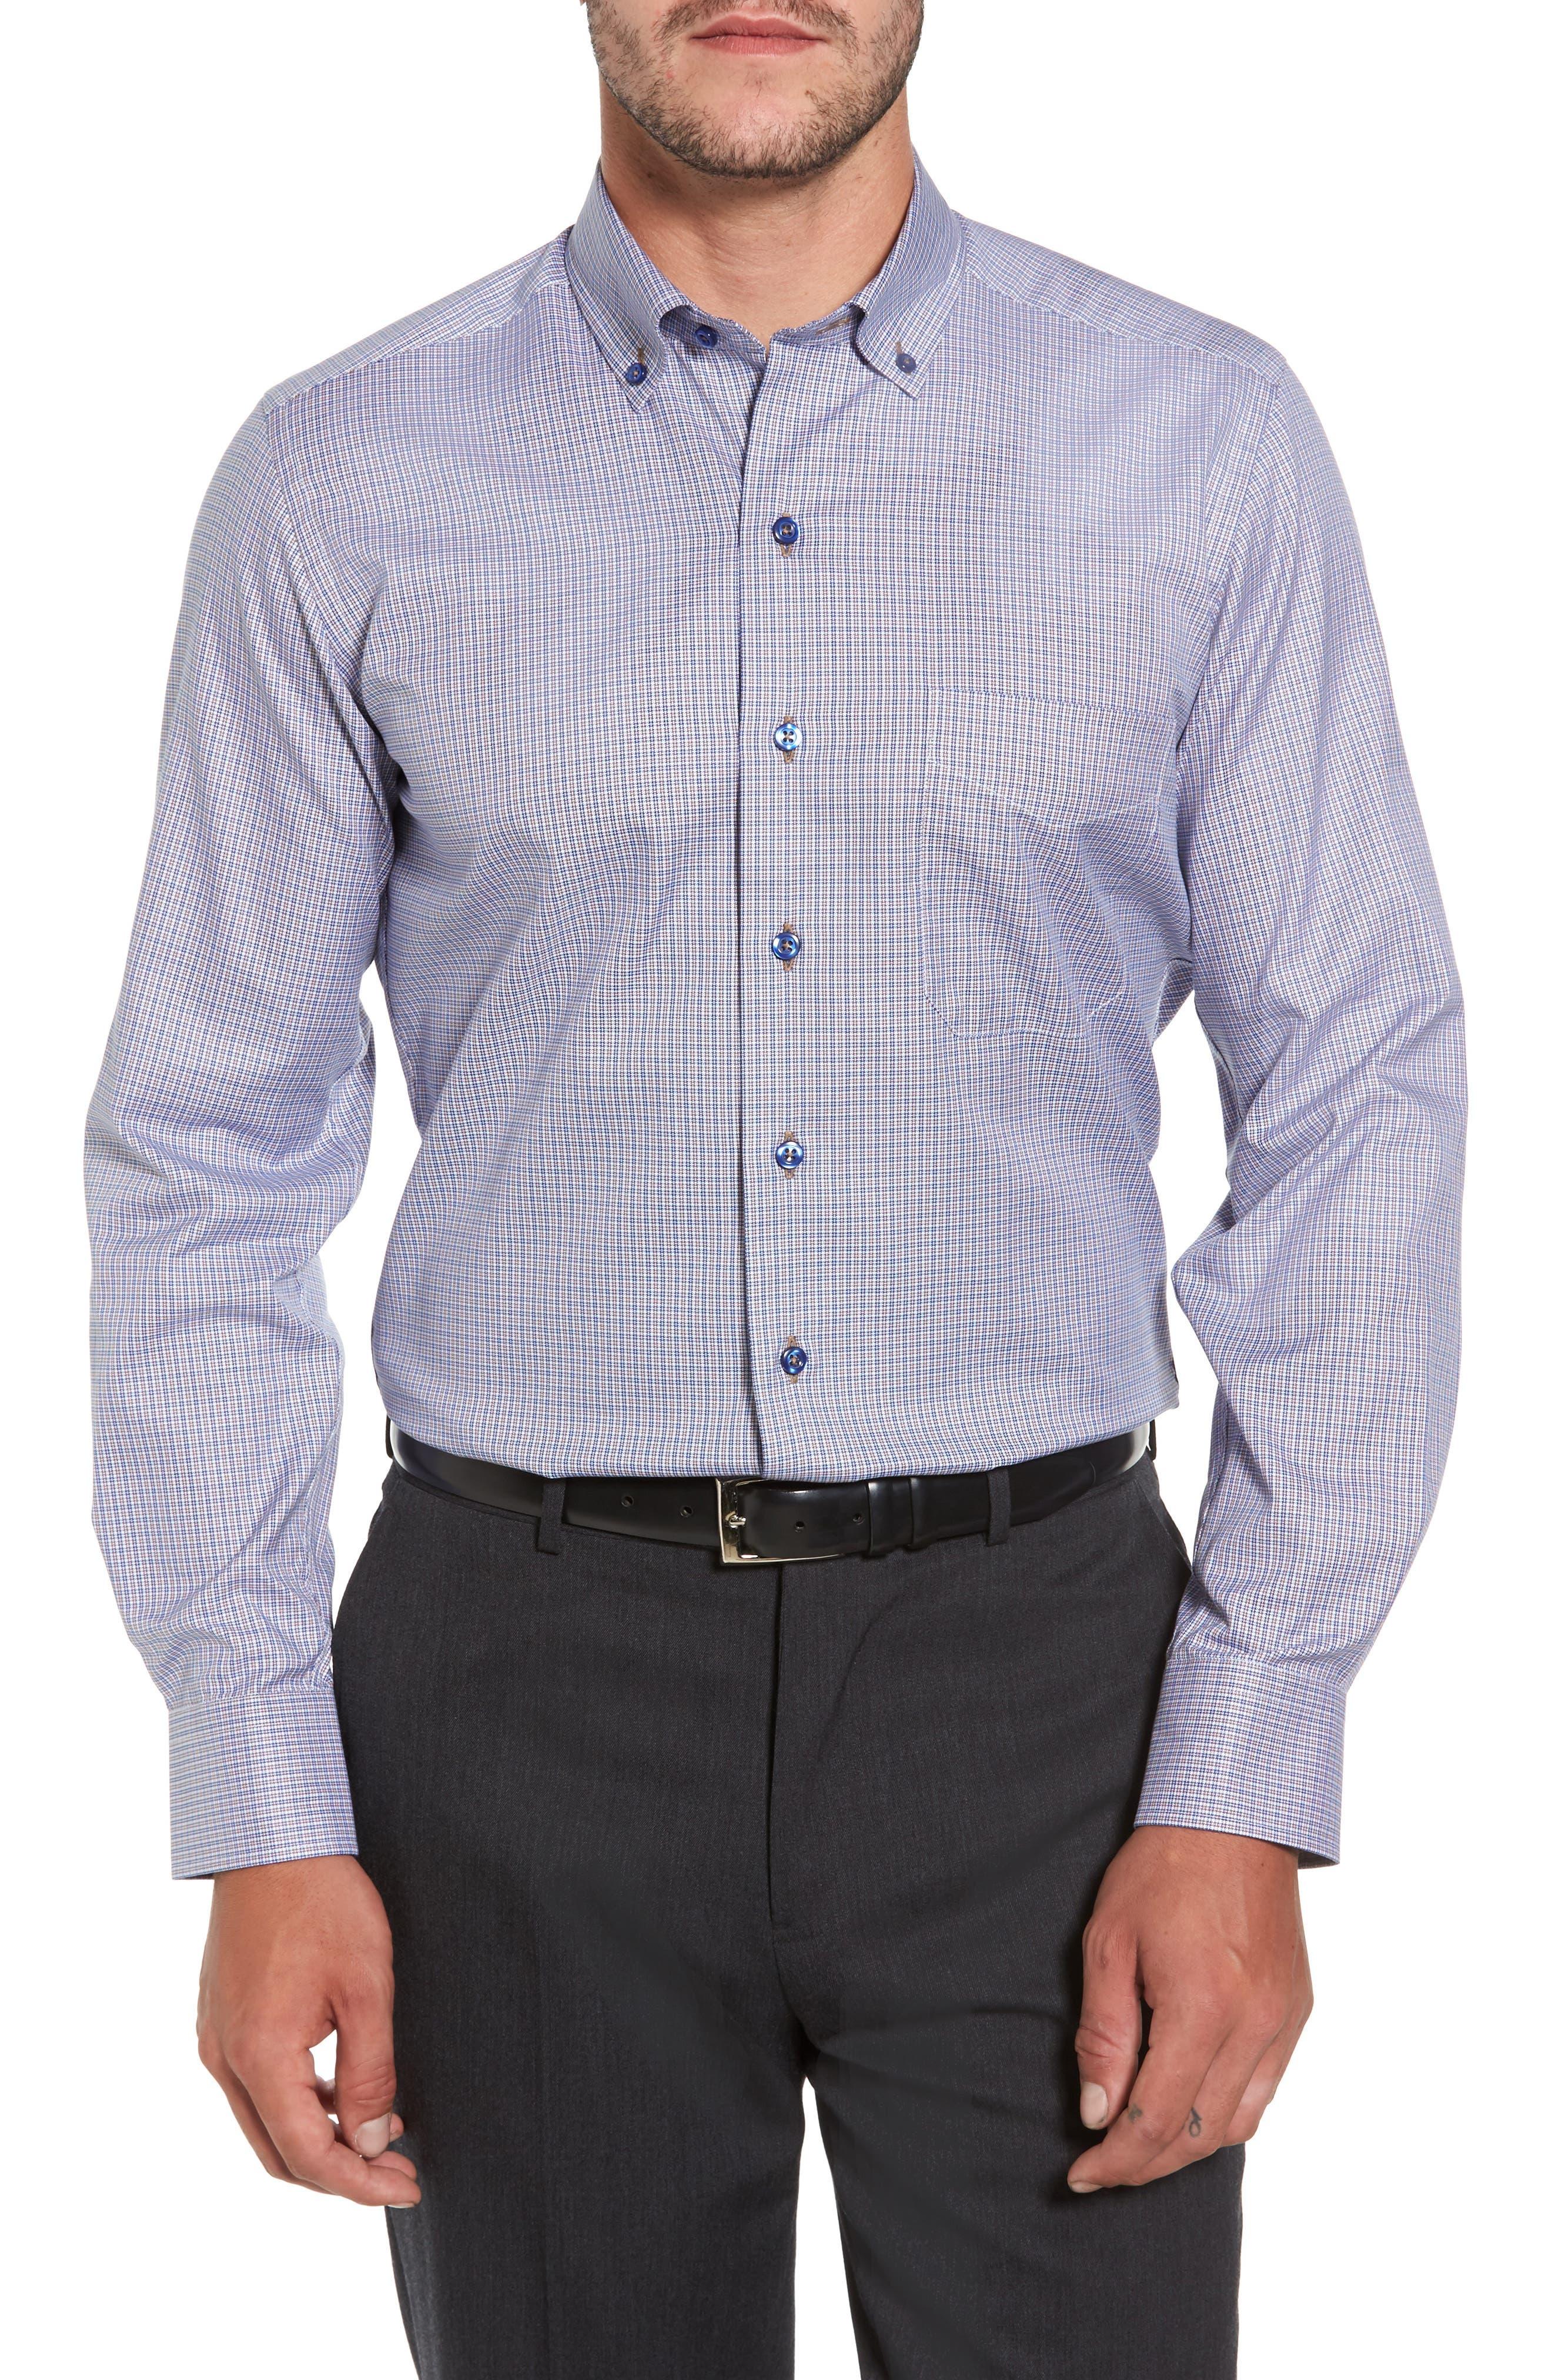 Microcheck Sport Shirt,                             Main thumbnail 1, color,                             Navy/ Chocolate